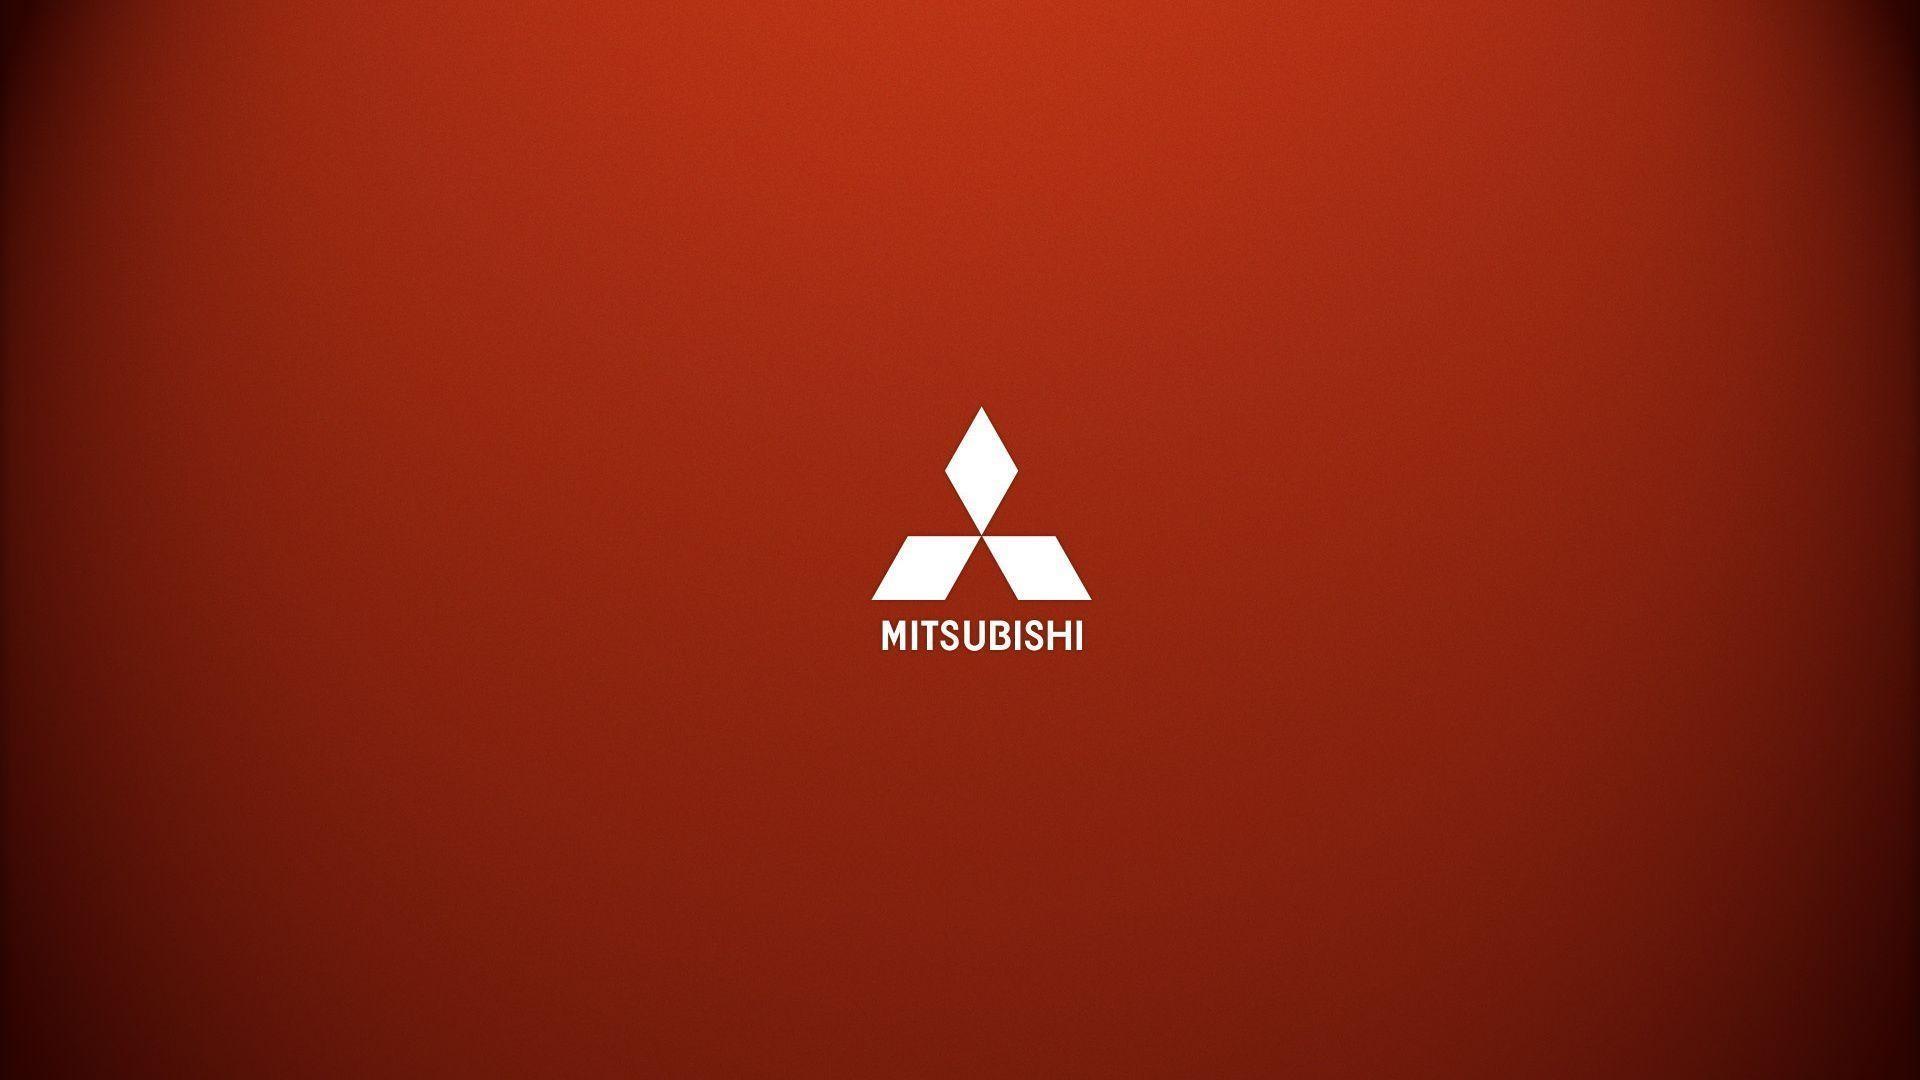 Res: 1920x1080, Mitsubishi Logo Wallpaper - WallpaperSafari